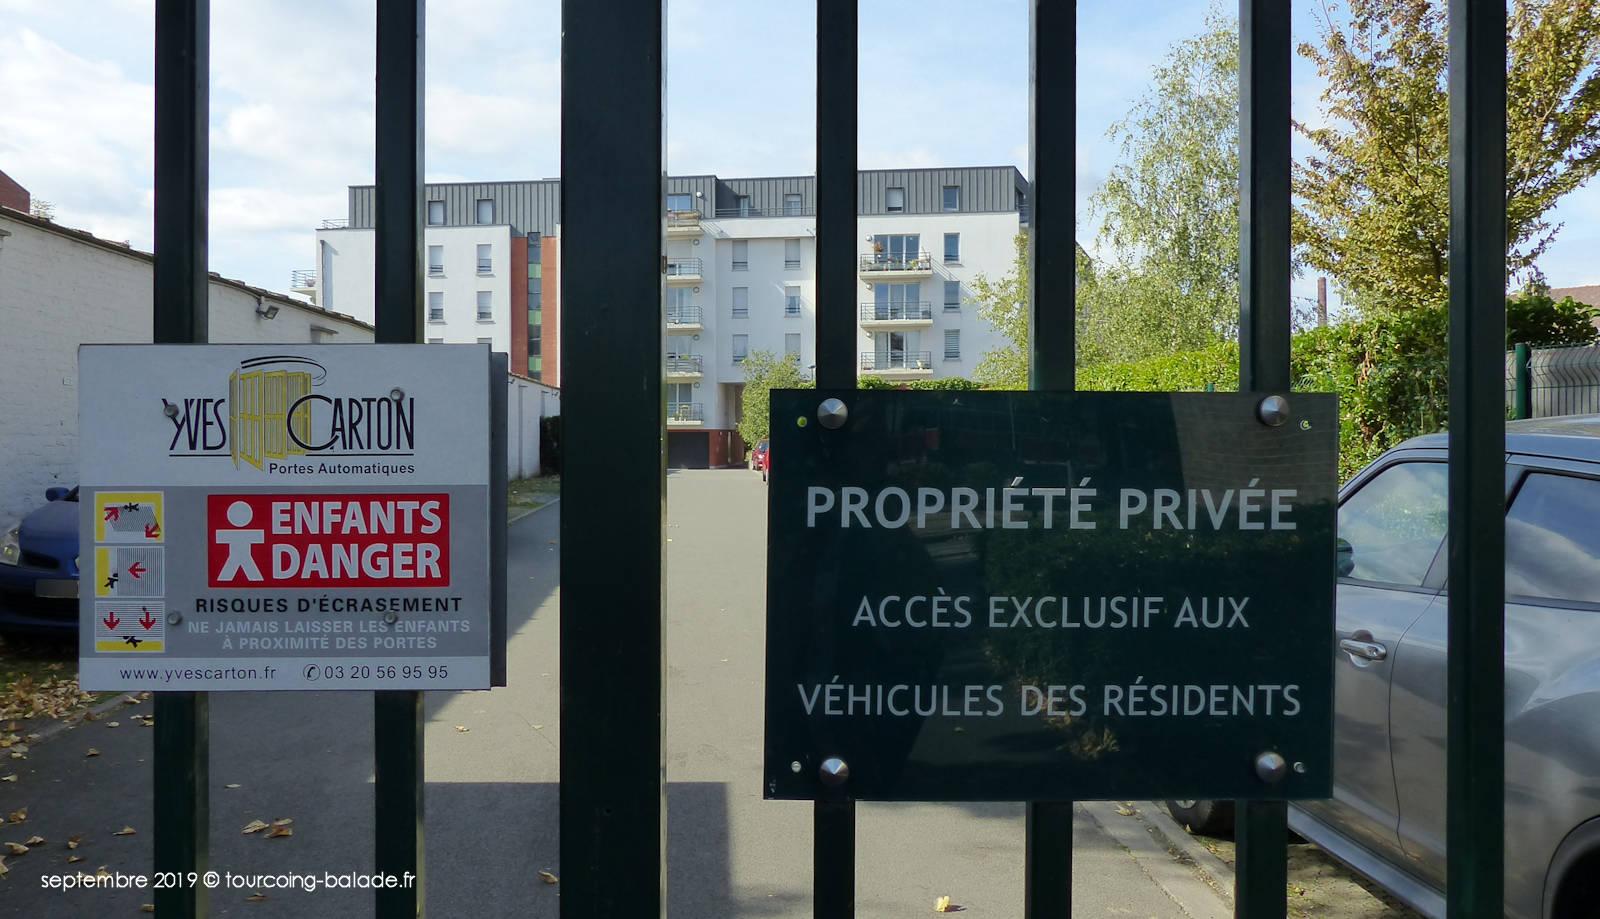 Résidence Privée City & Park Tourcoing